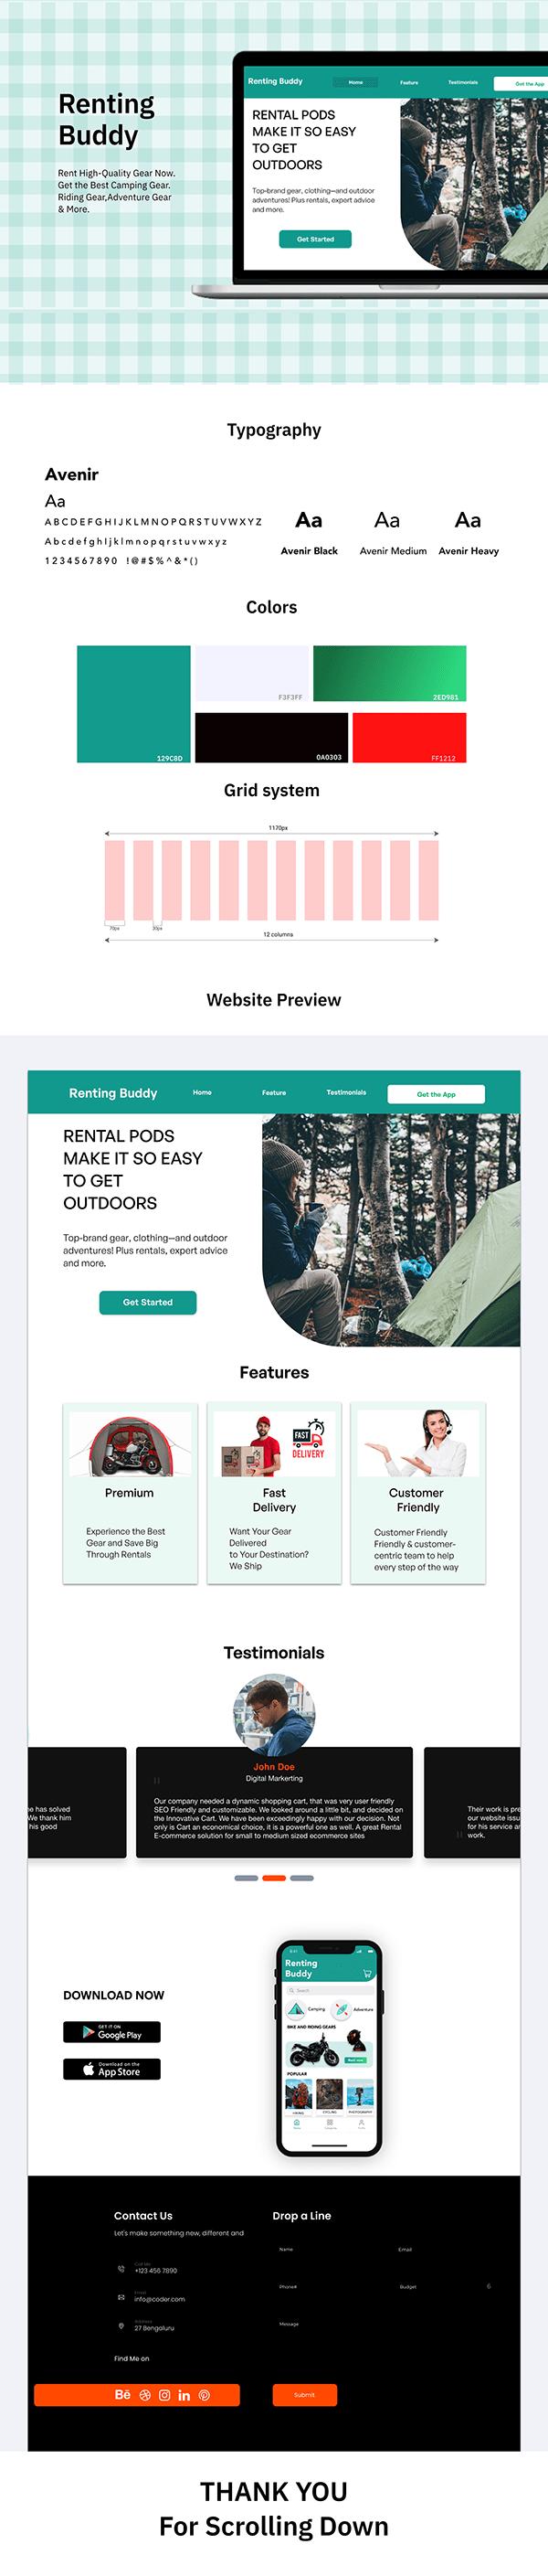 Website presentation-Rental App